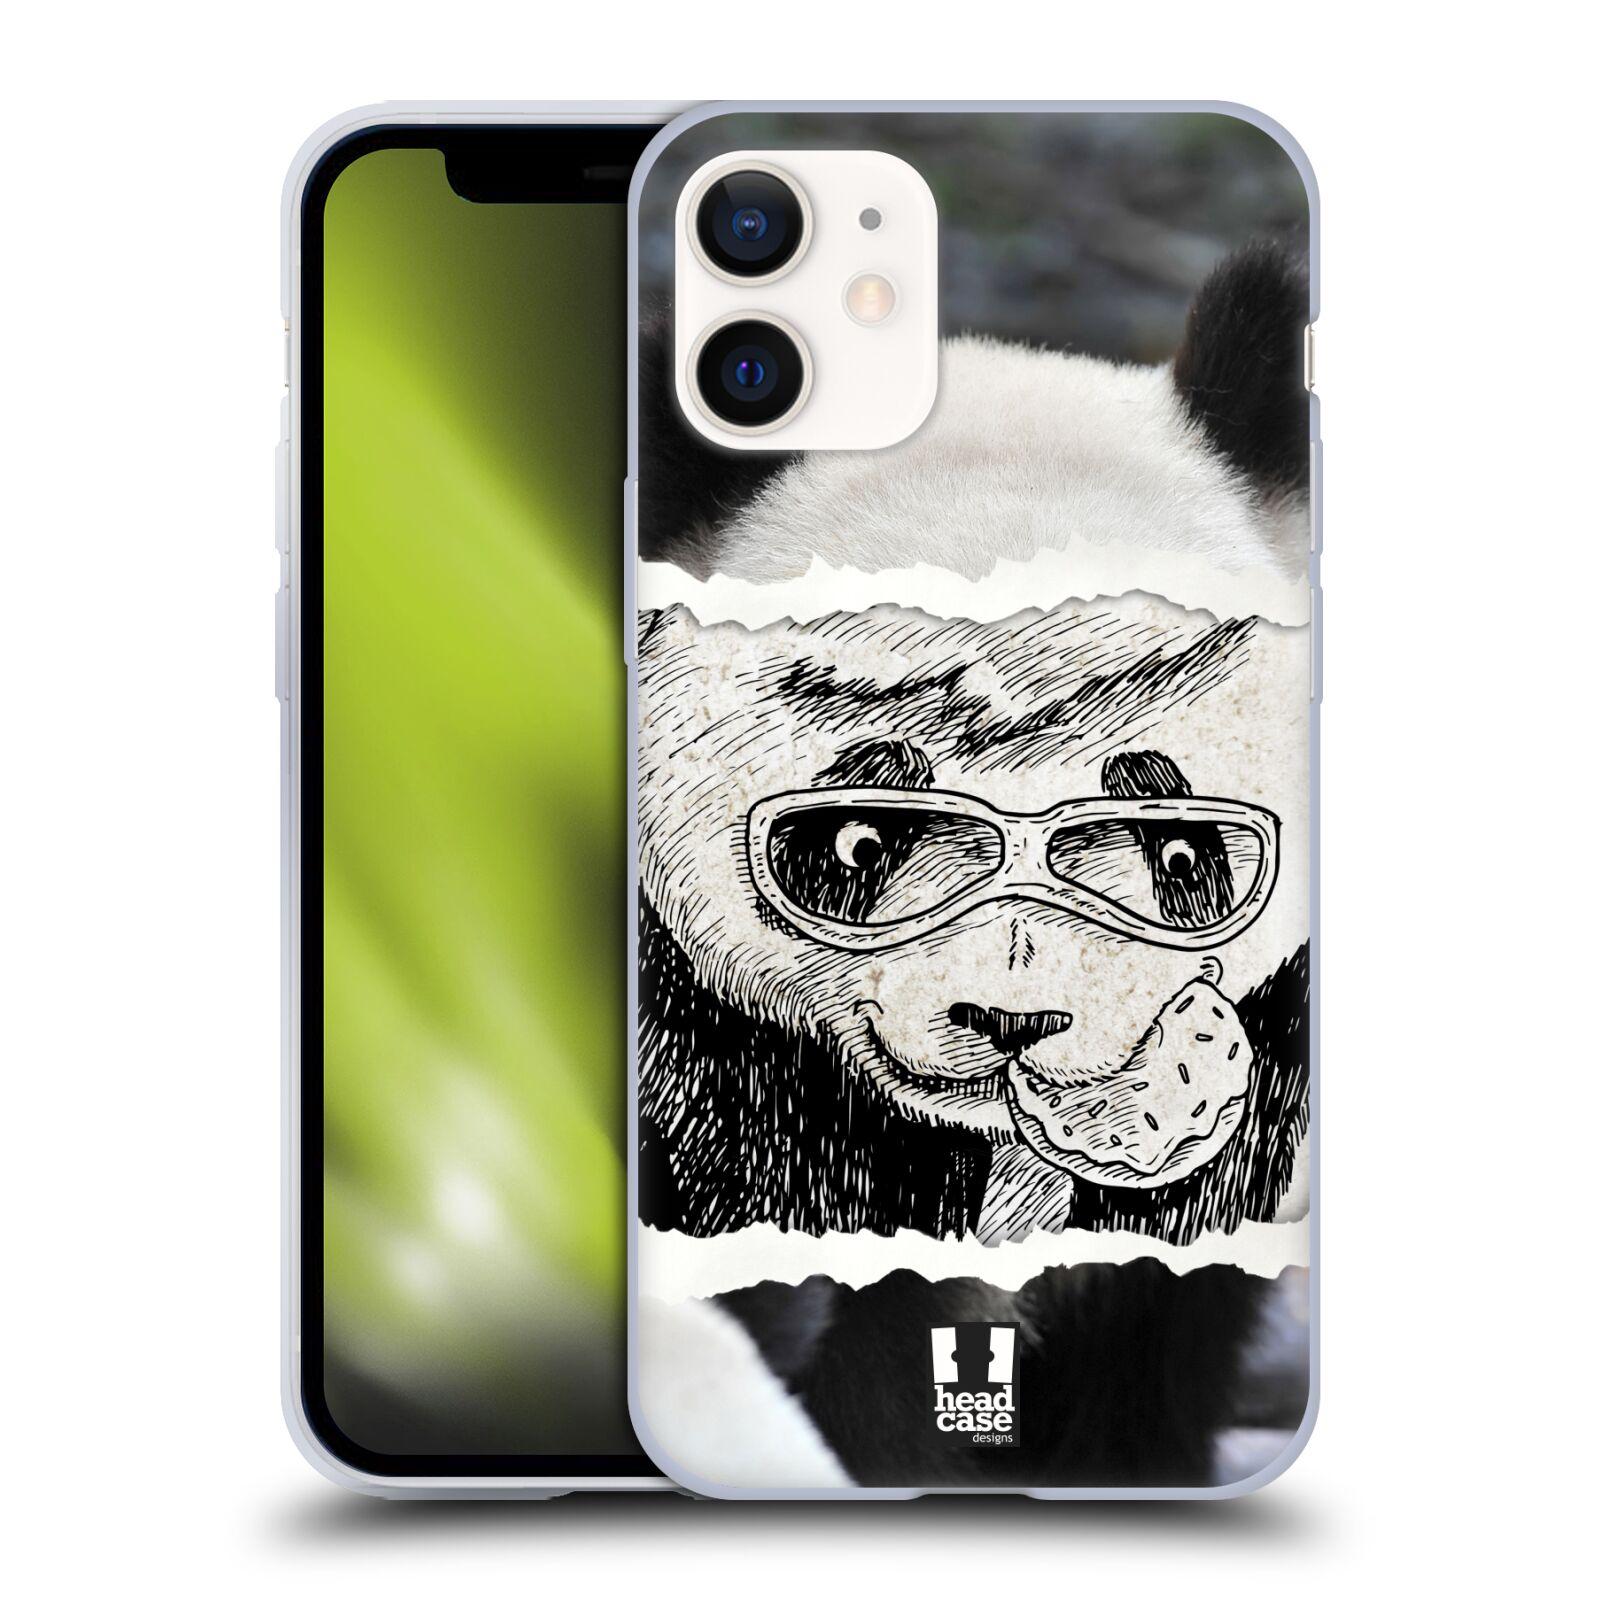 Plastový obal na mobil Apple Iphone 12 MINI vzor zvířata koláž roztomilá panda